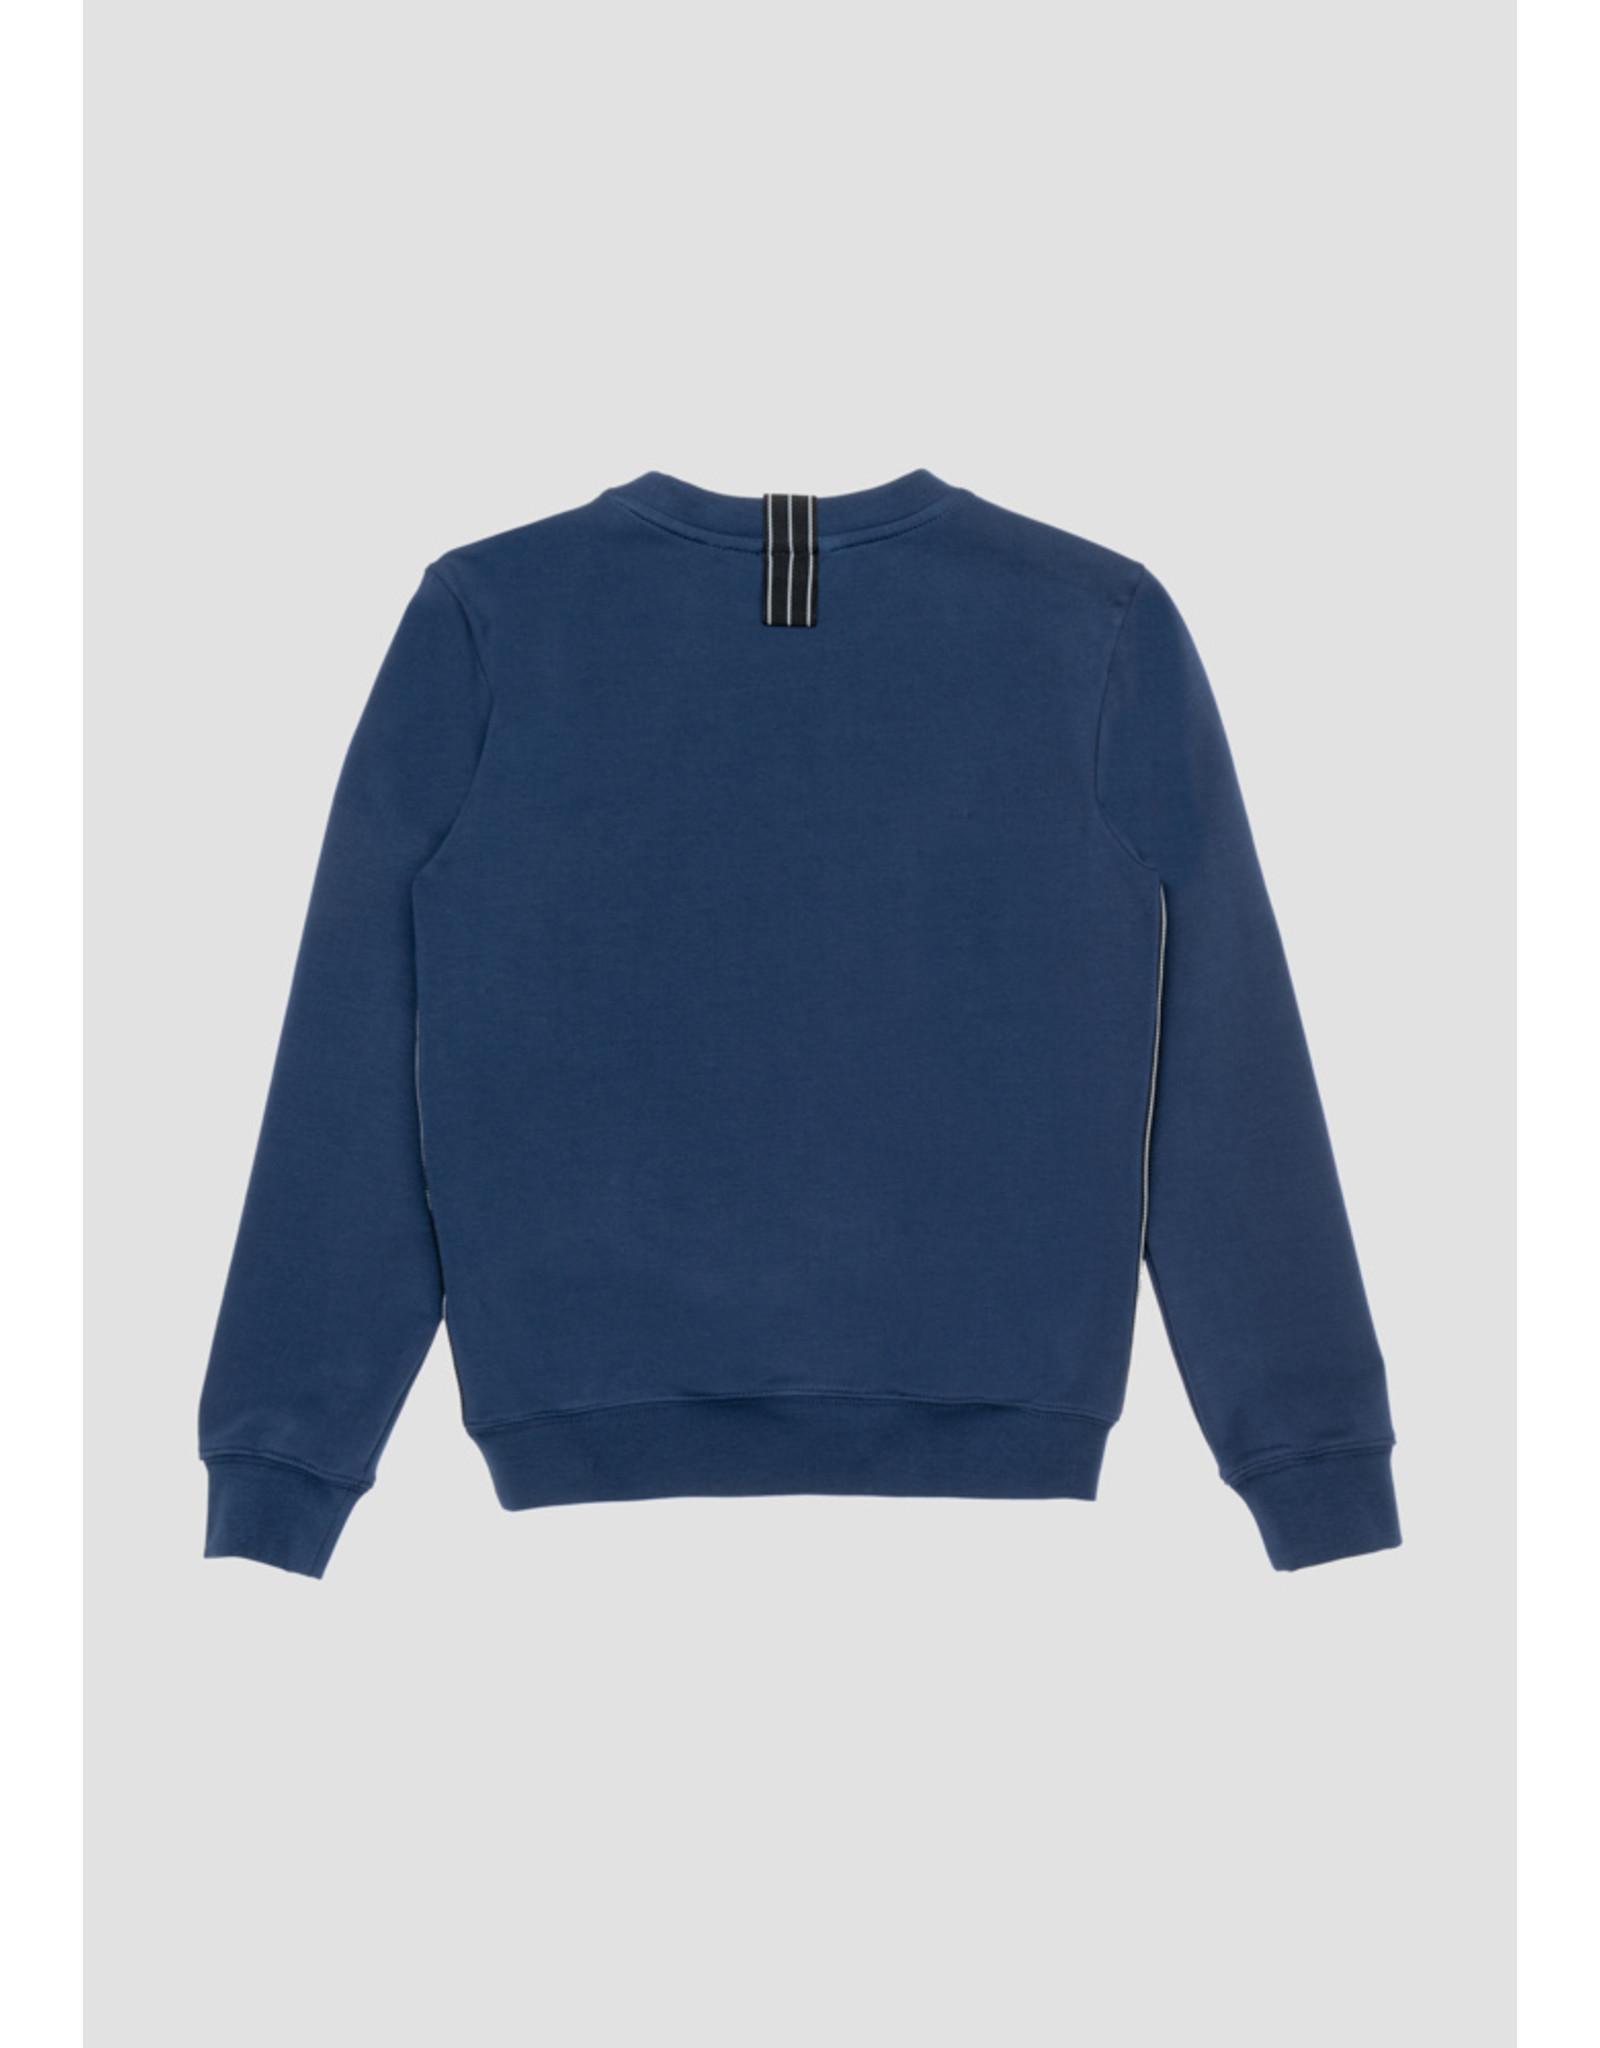 Antony Morato Sweater rubber logo donker blauw